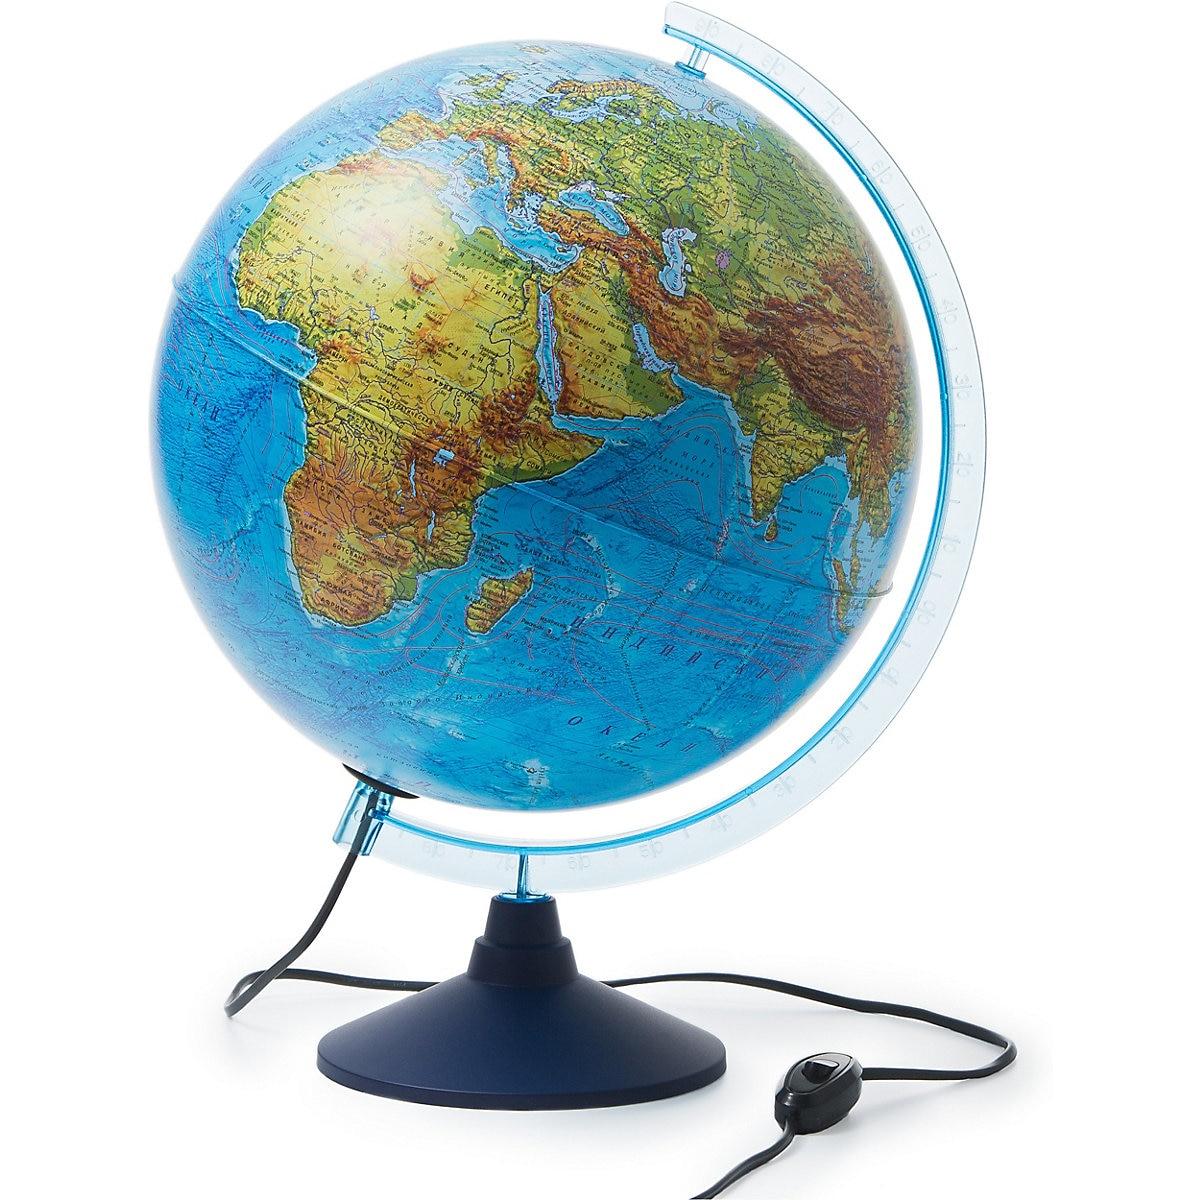 GLOBEN Desk Set 7327228 Globe Accessories Organizer For Office And School Schools Offices MTpromo